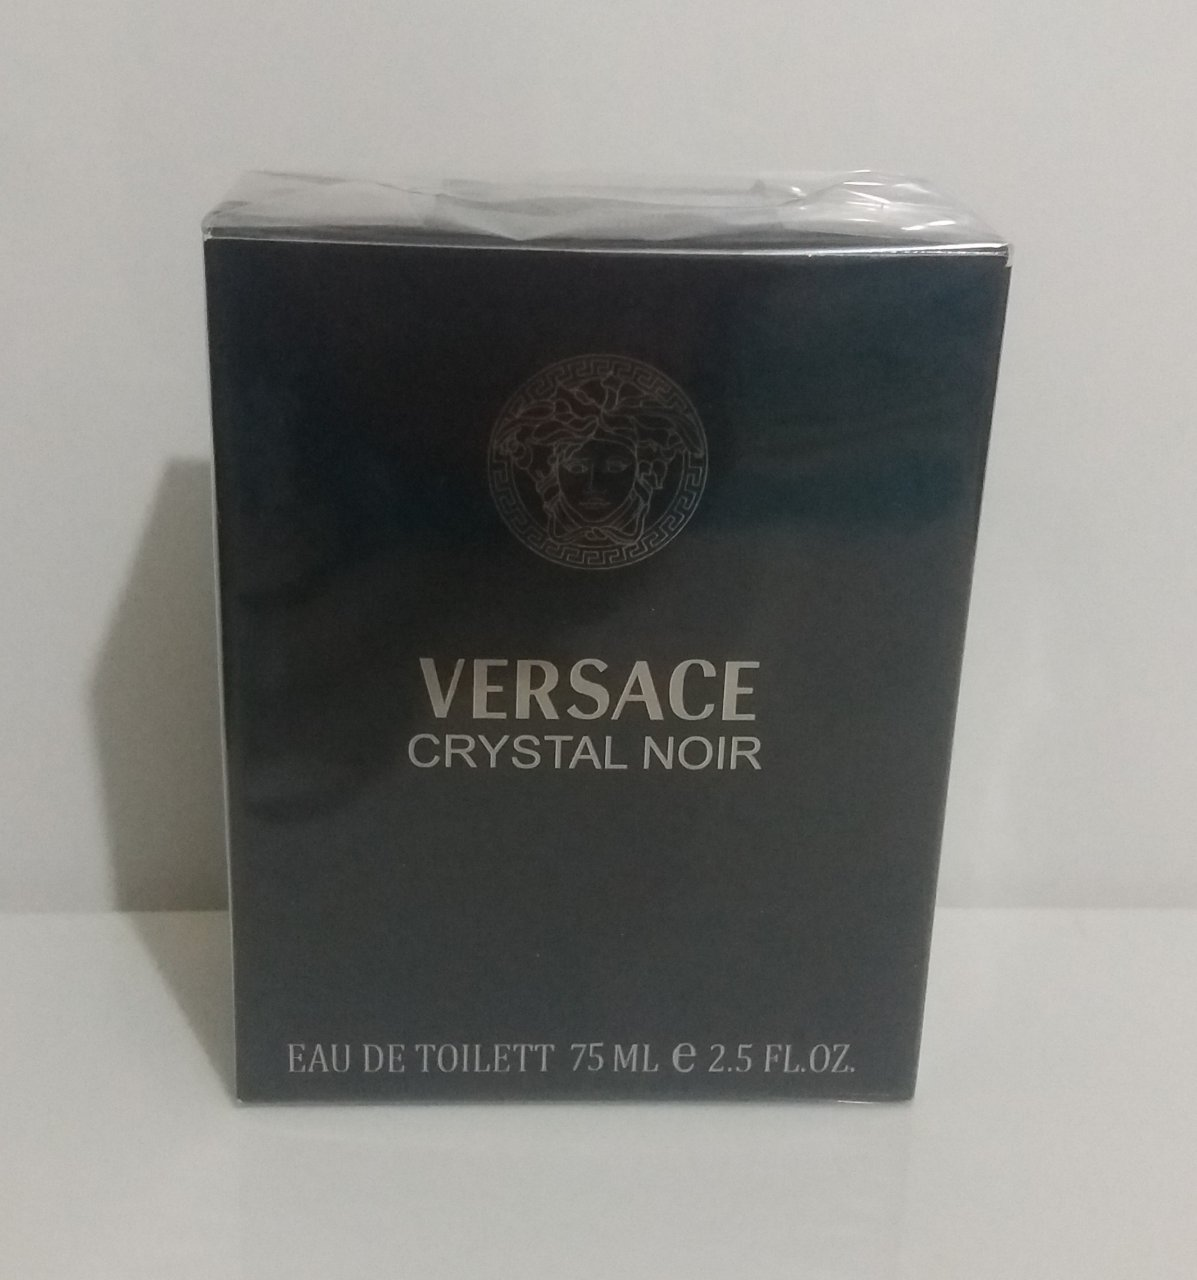 ادو پرفیوم زنانه ورساچه مدل Crystal Noir حجم 75 میلی لیتر